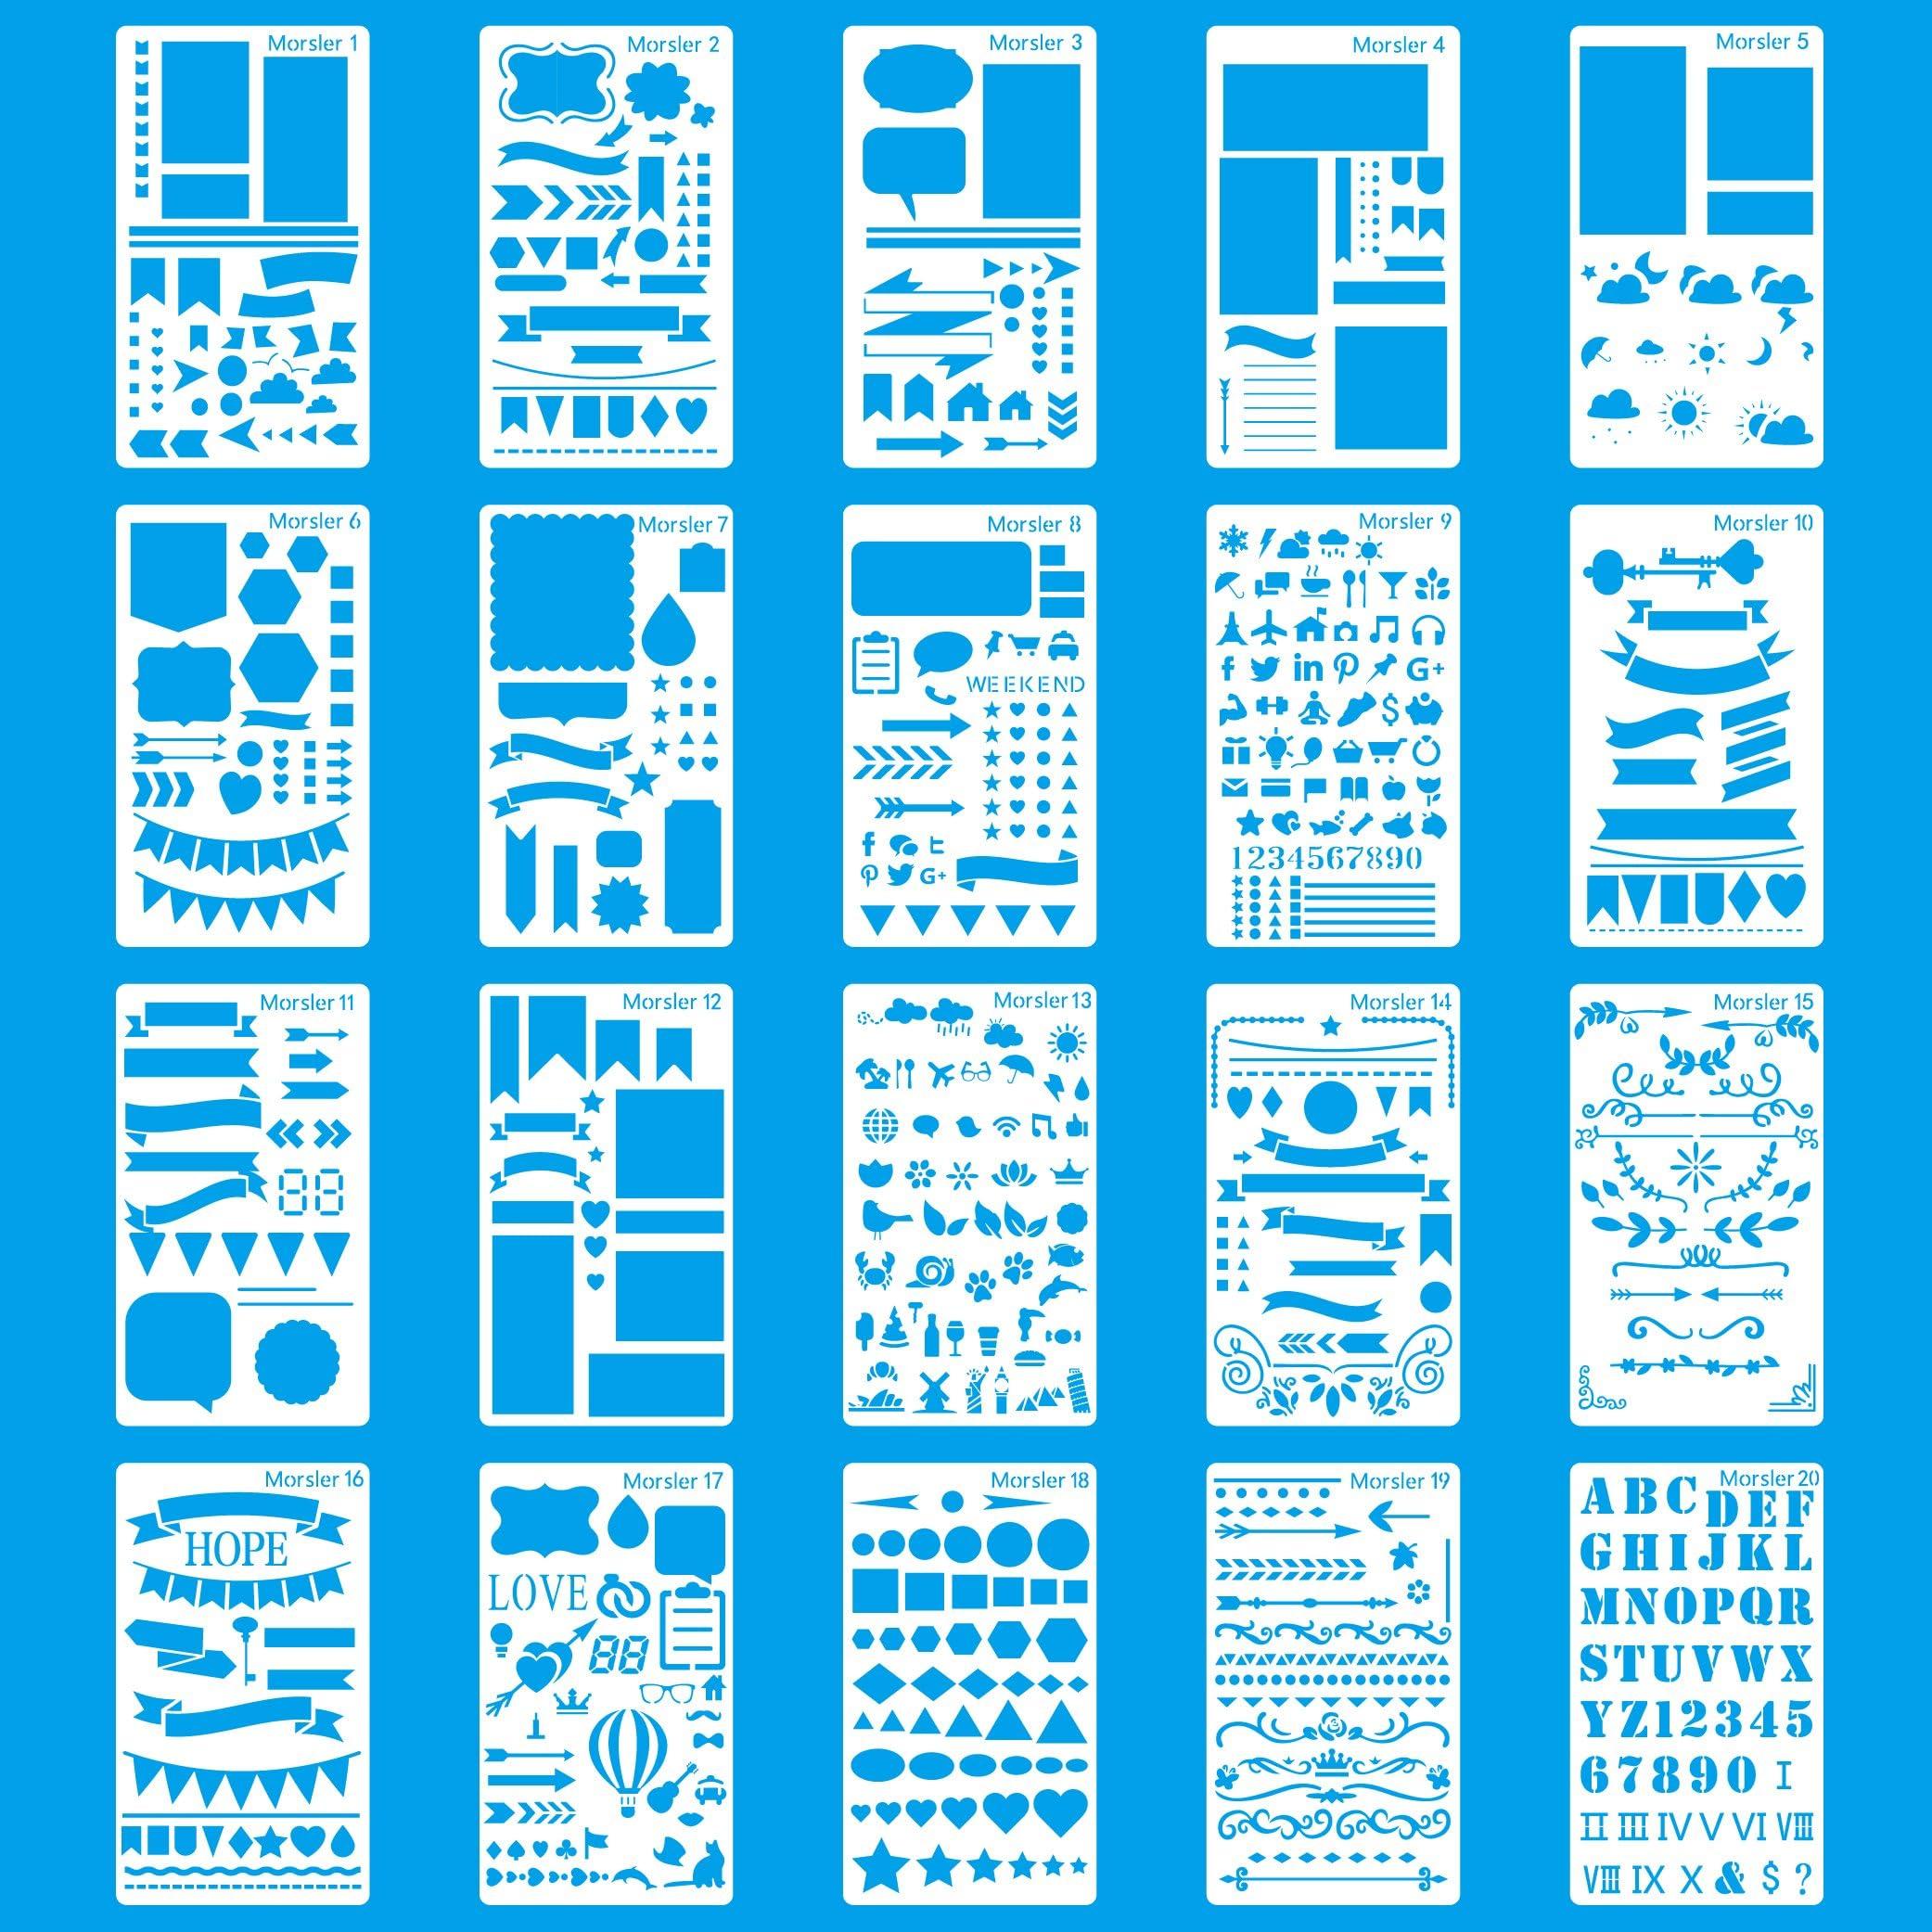 Soft Plastic Sheet Planner Stencil Plastic Stencil 6.9 x 3.8 Bullet Journal Stencil Holiday Themed Stencil 17.6 x 9.6 cm